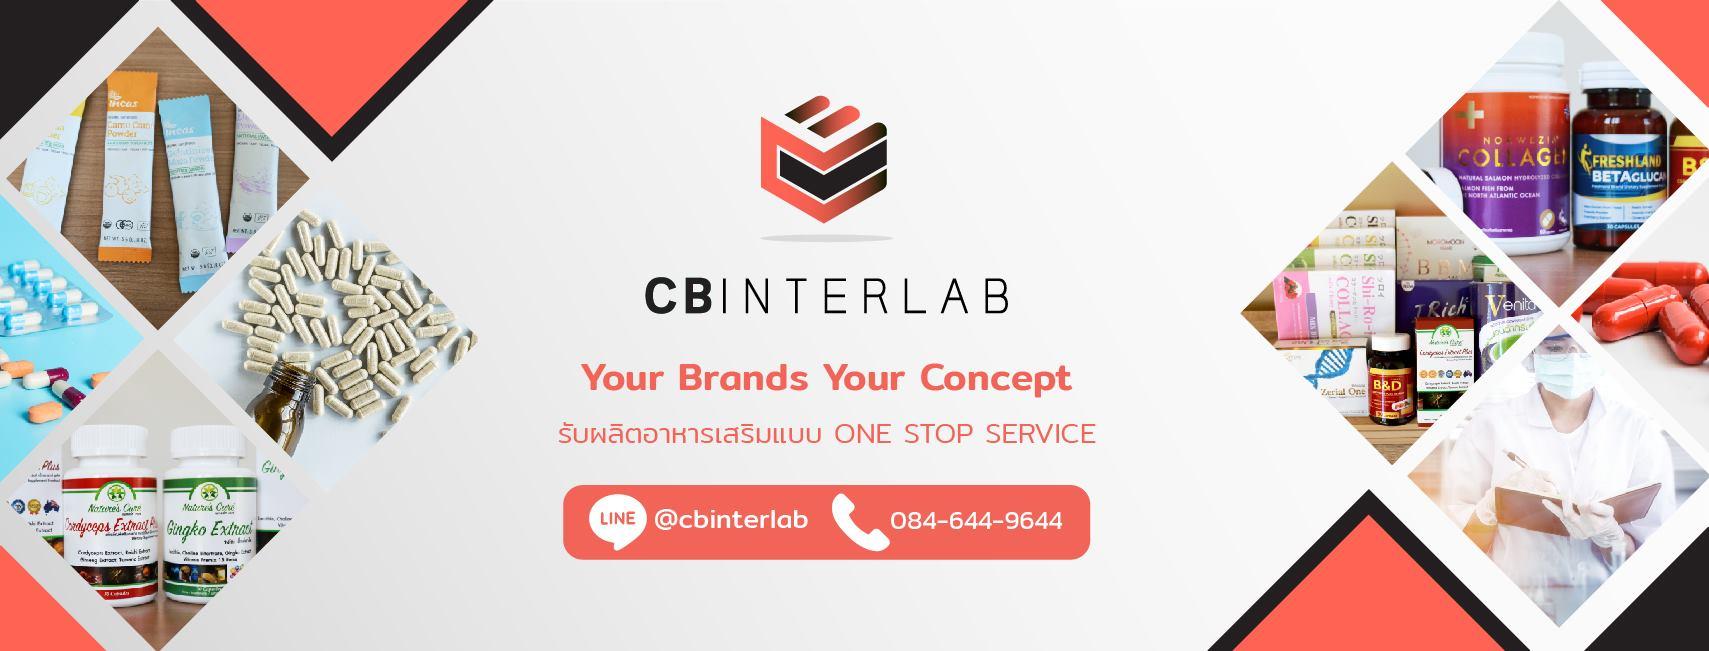 CB interlab รับจ้างผลิตอาหารเสริม